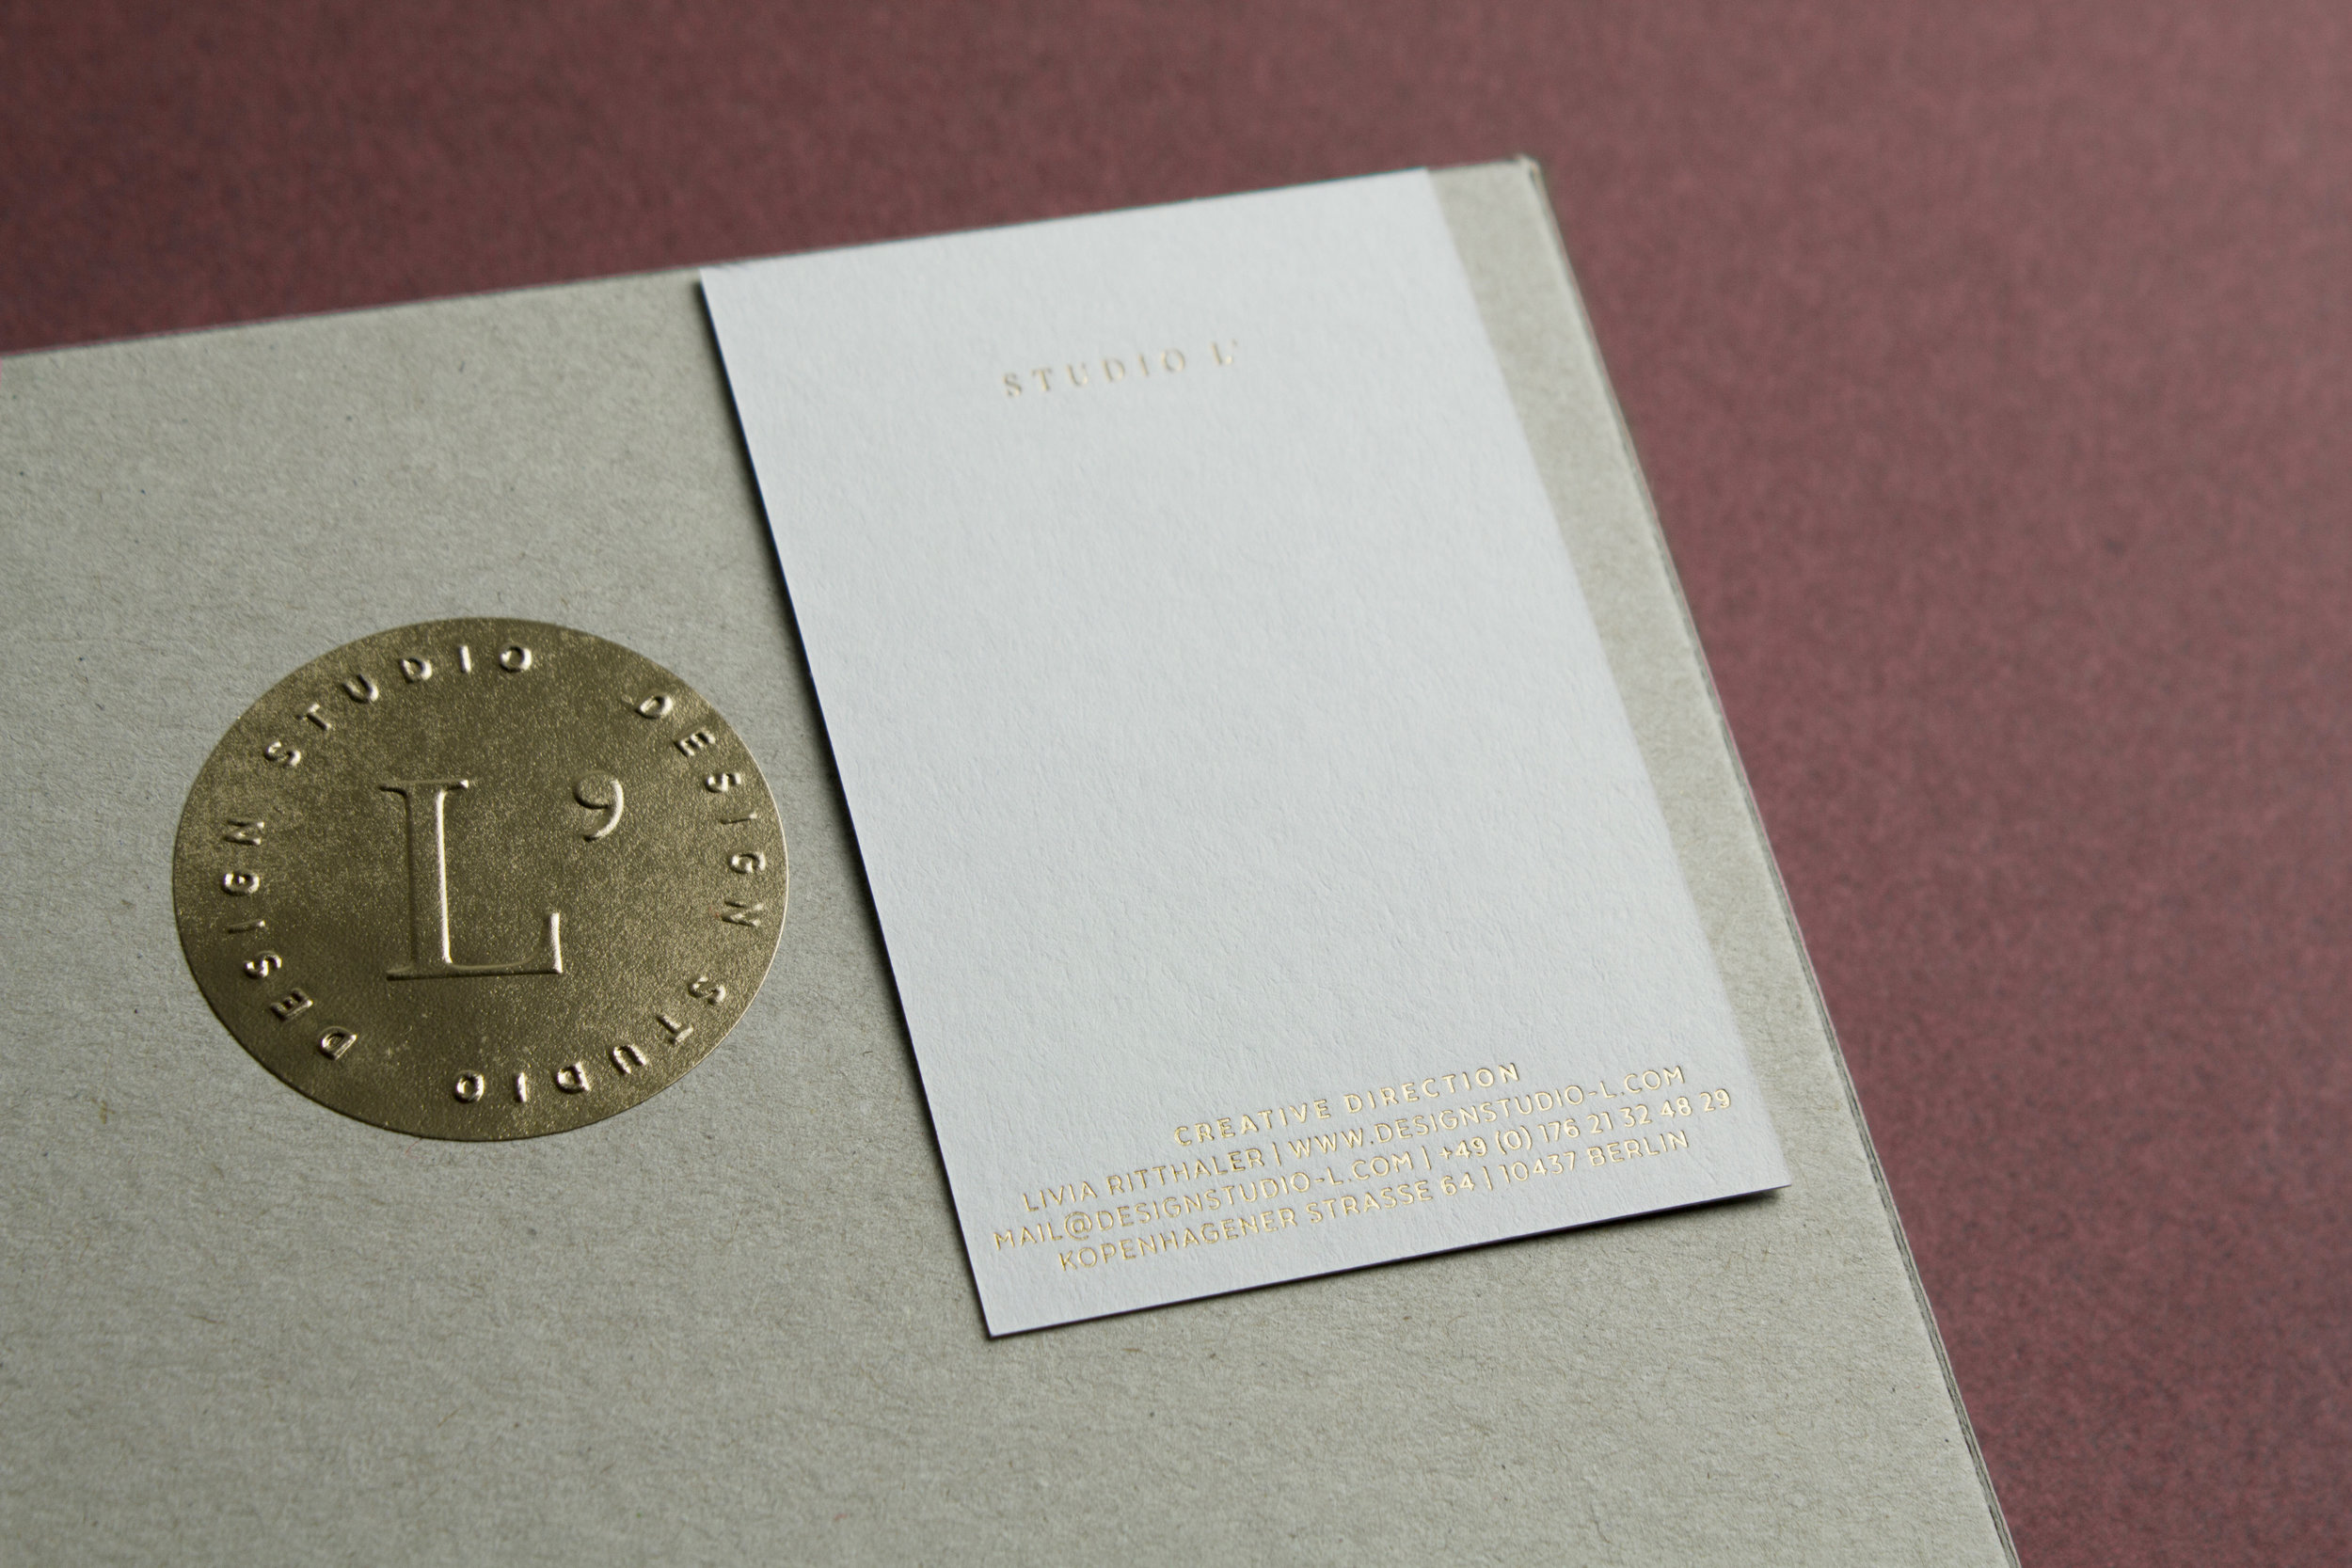 Livia_Ritthaler_Studio_L_Box_Card_Gold_Corporate_Design.jpg